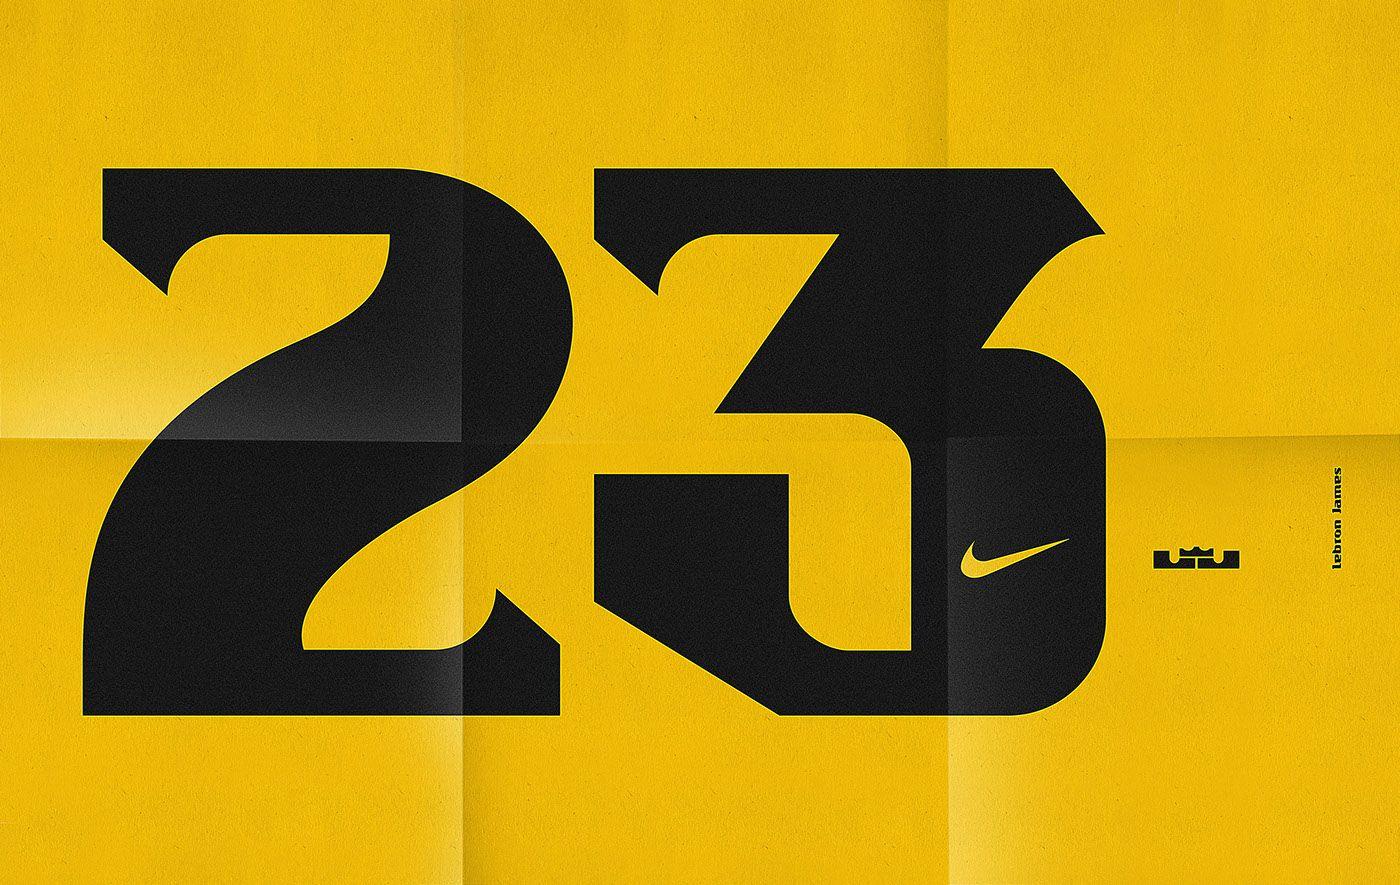 Display typeface for NBA basketball player LeBron James